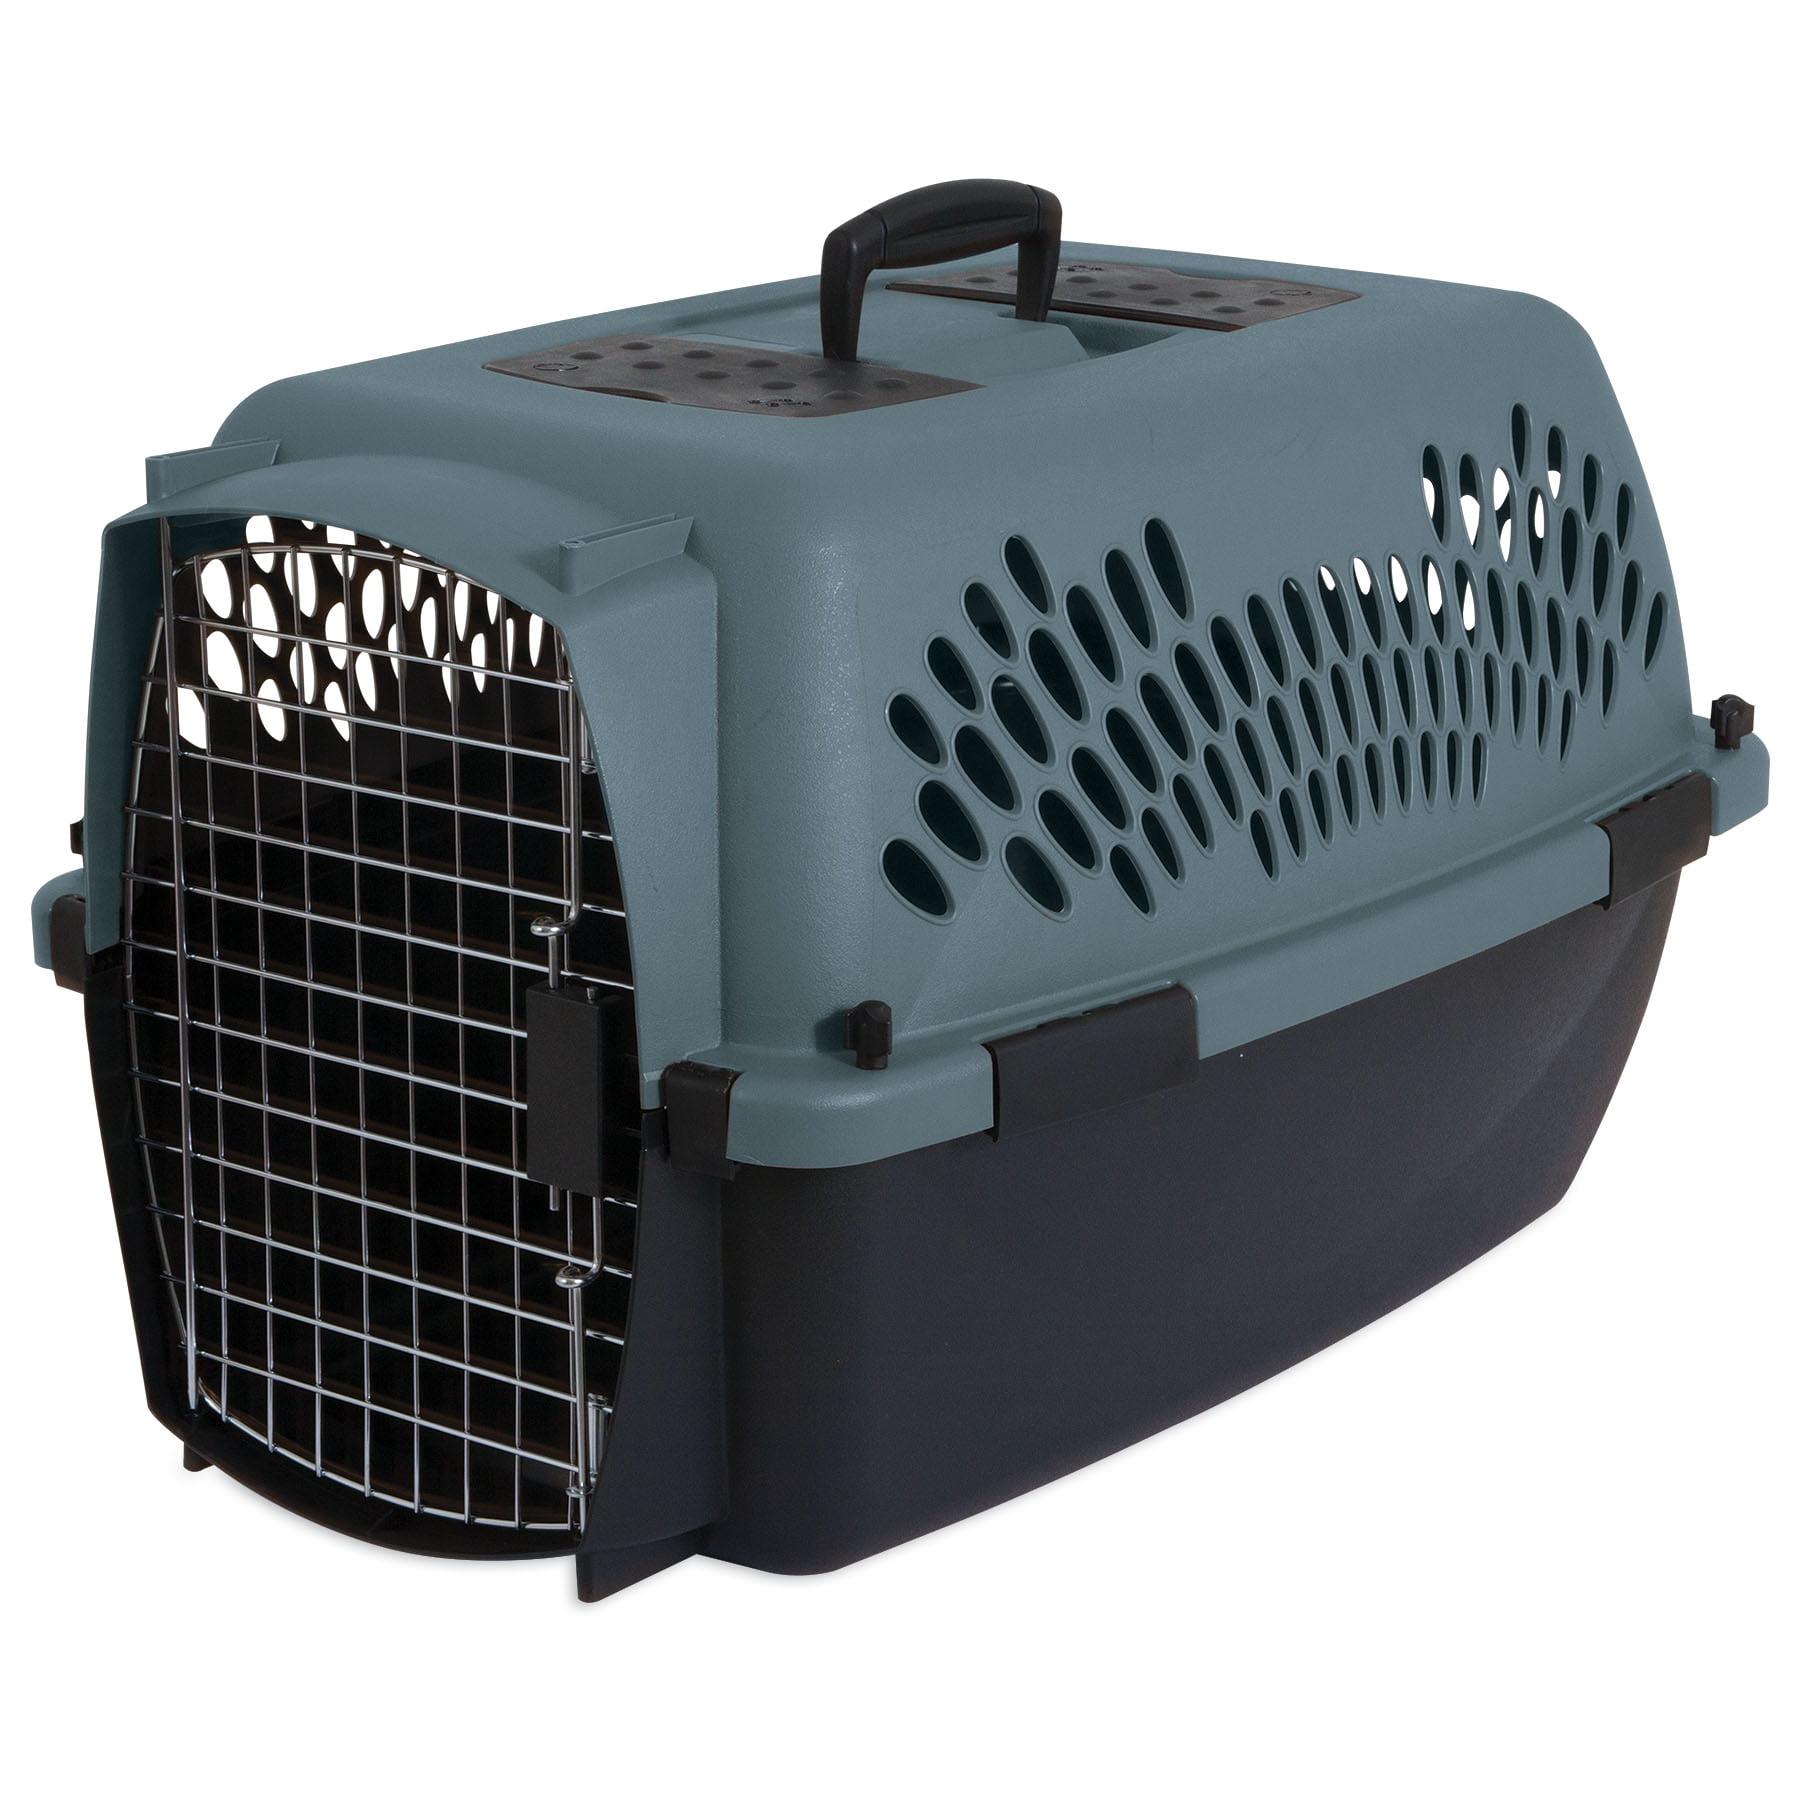 "Aspen Pet Pet Porter 24"" Fashion Kennel, 15-20Lbs"